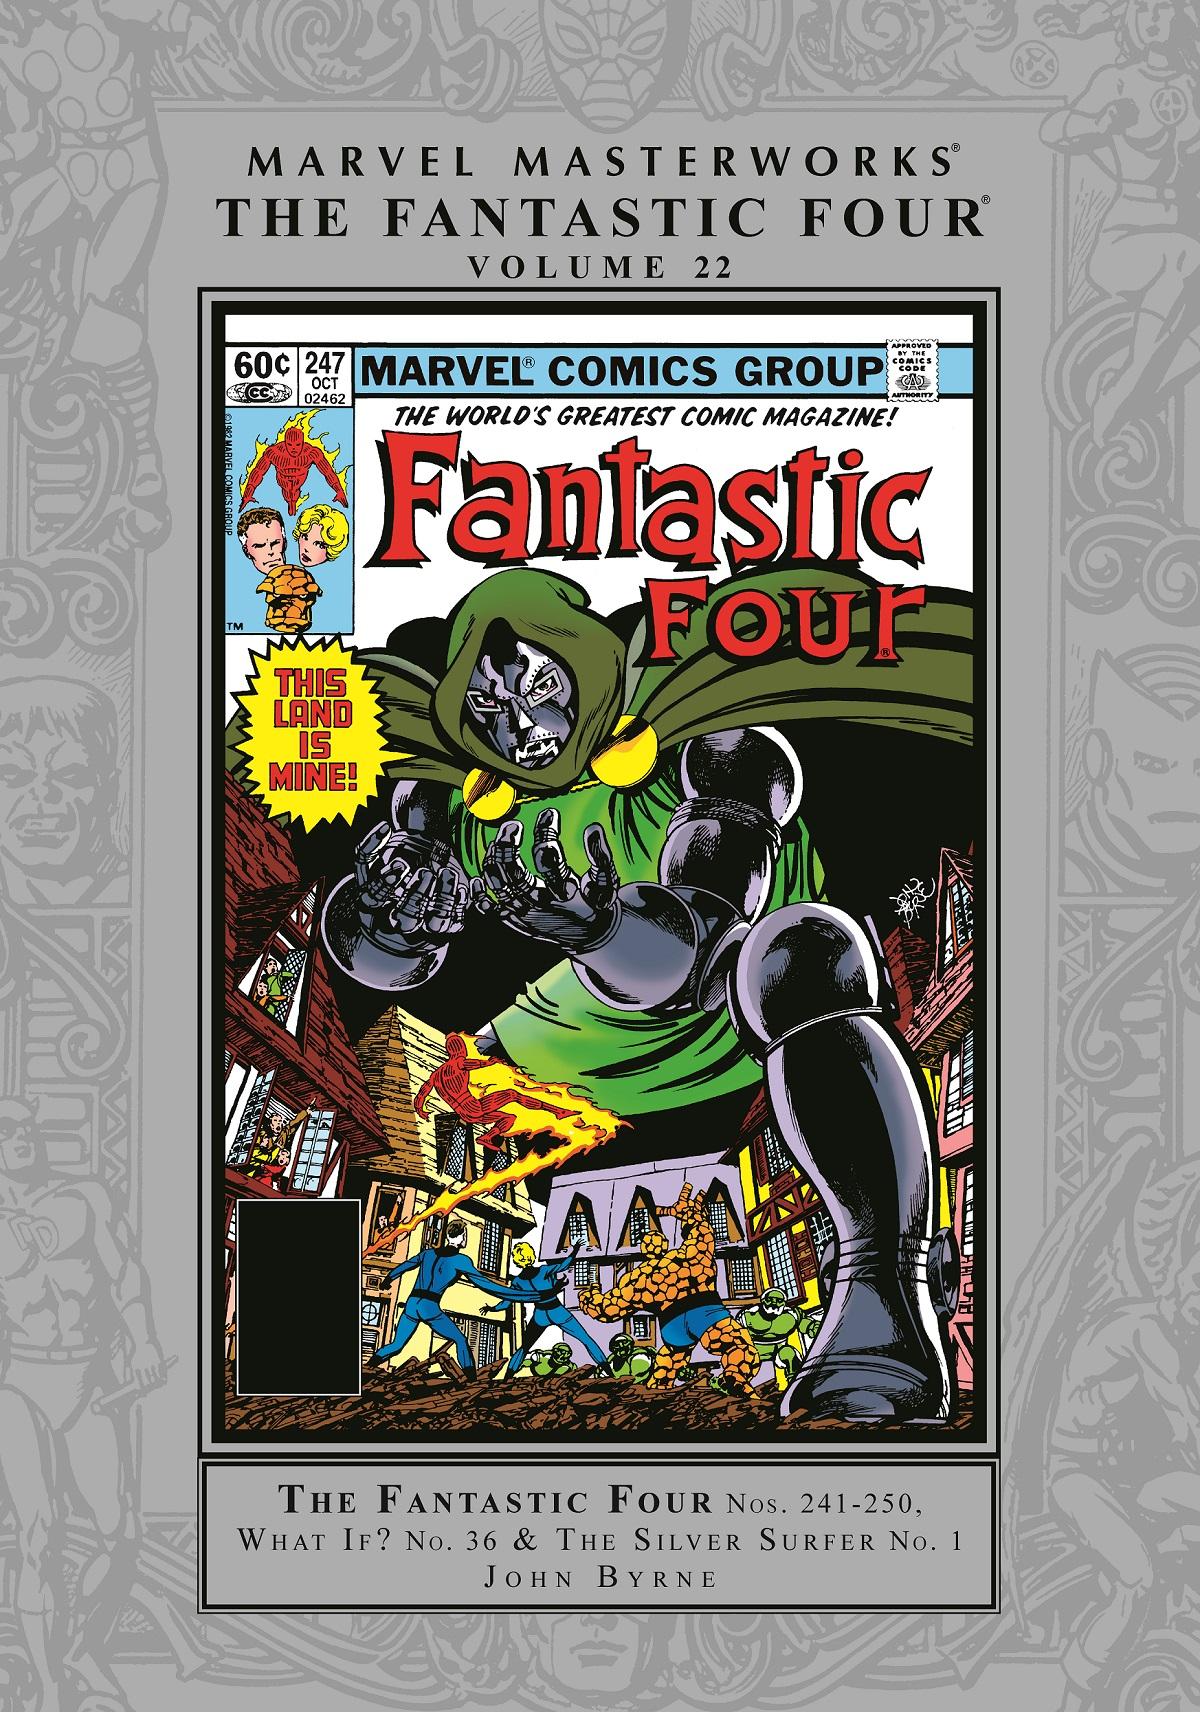 Marvel Masterworks: The Fantastic Four Vol. 22 (Hardcover)